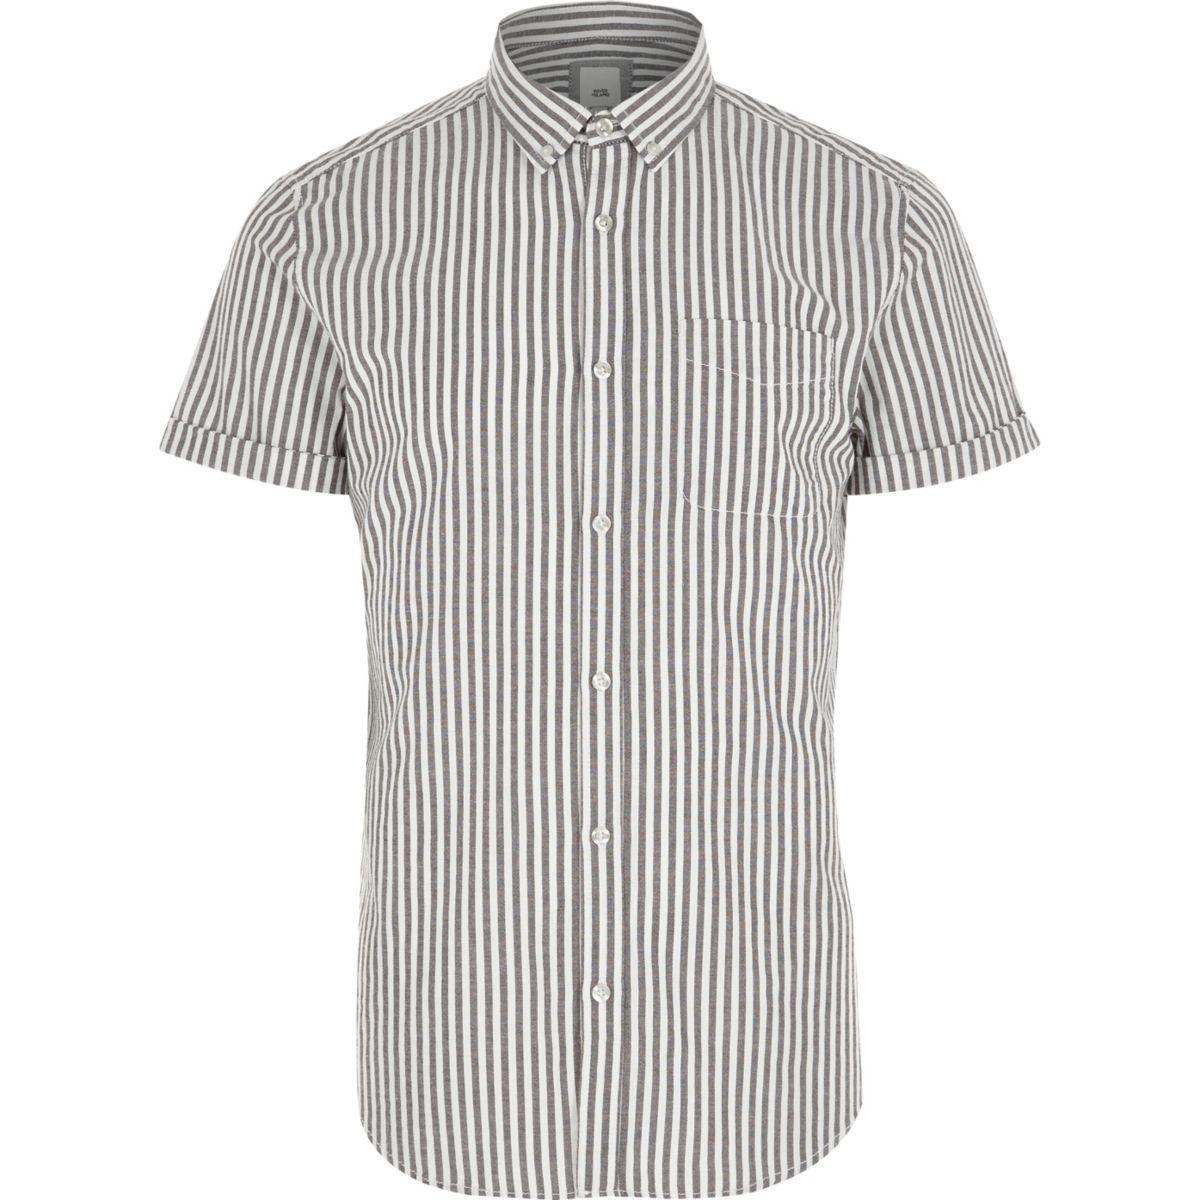 Grey stripe slim fit short sleeve shirt